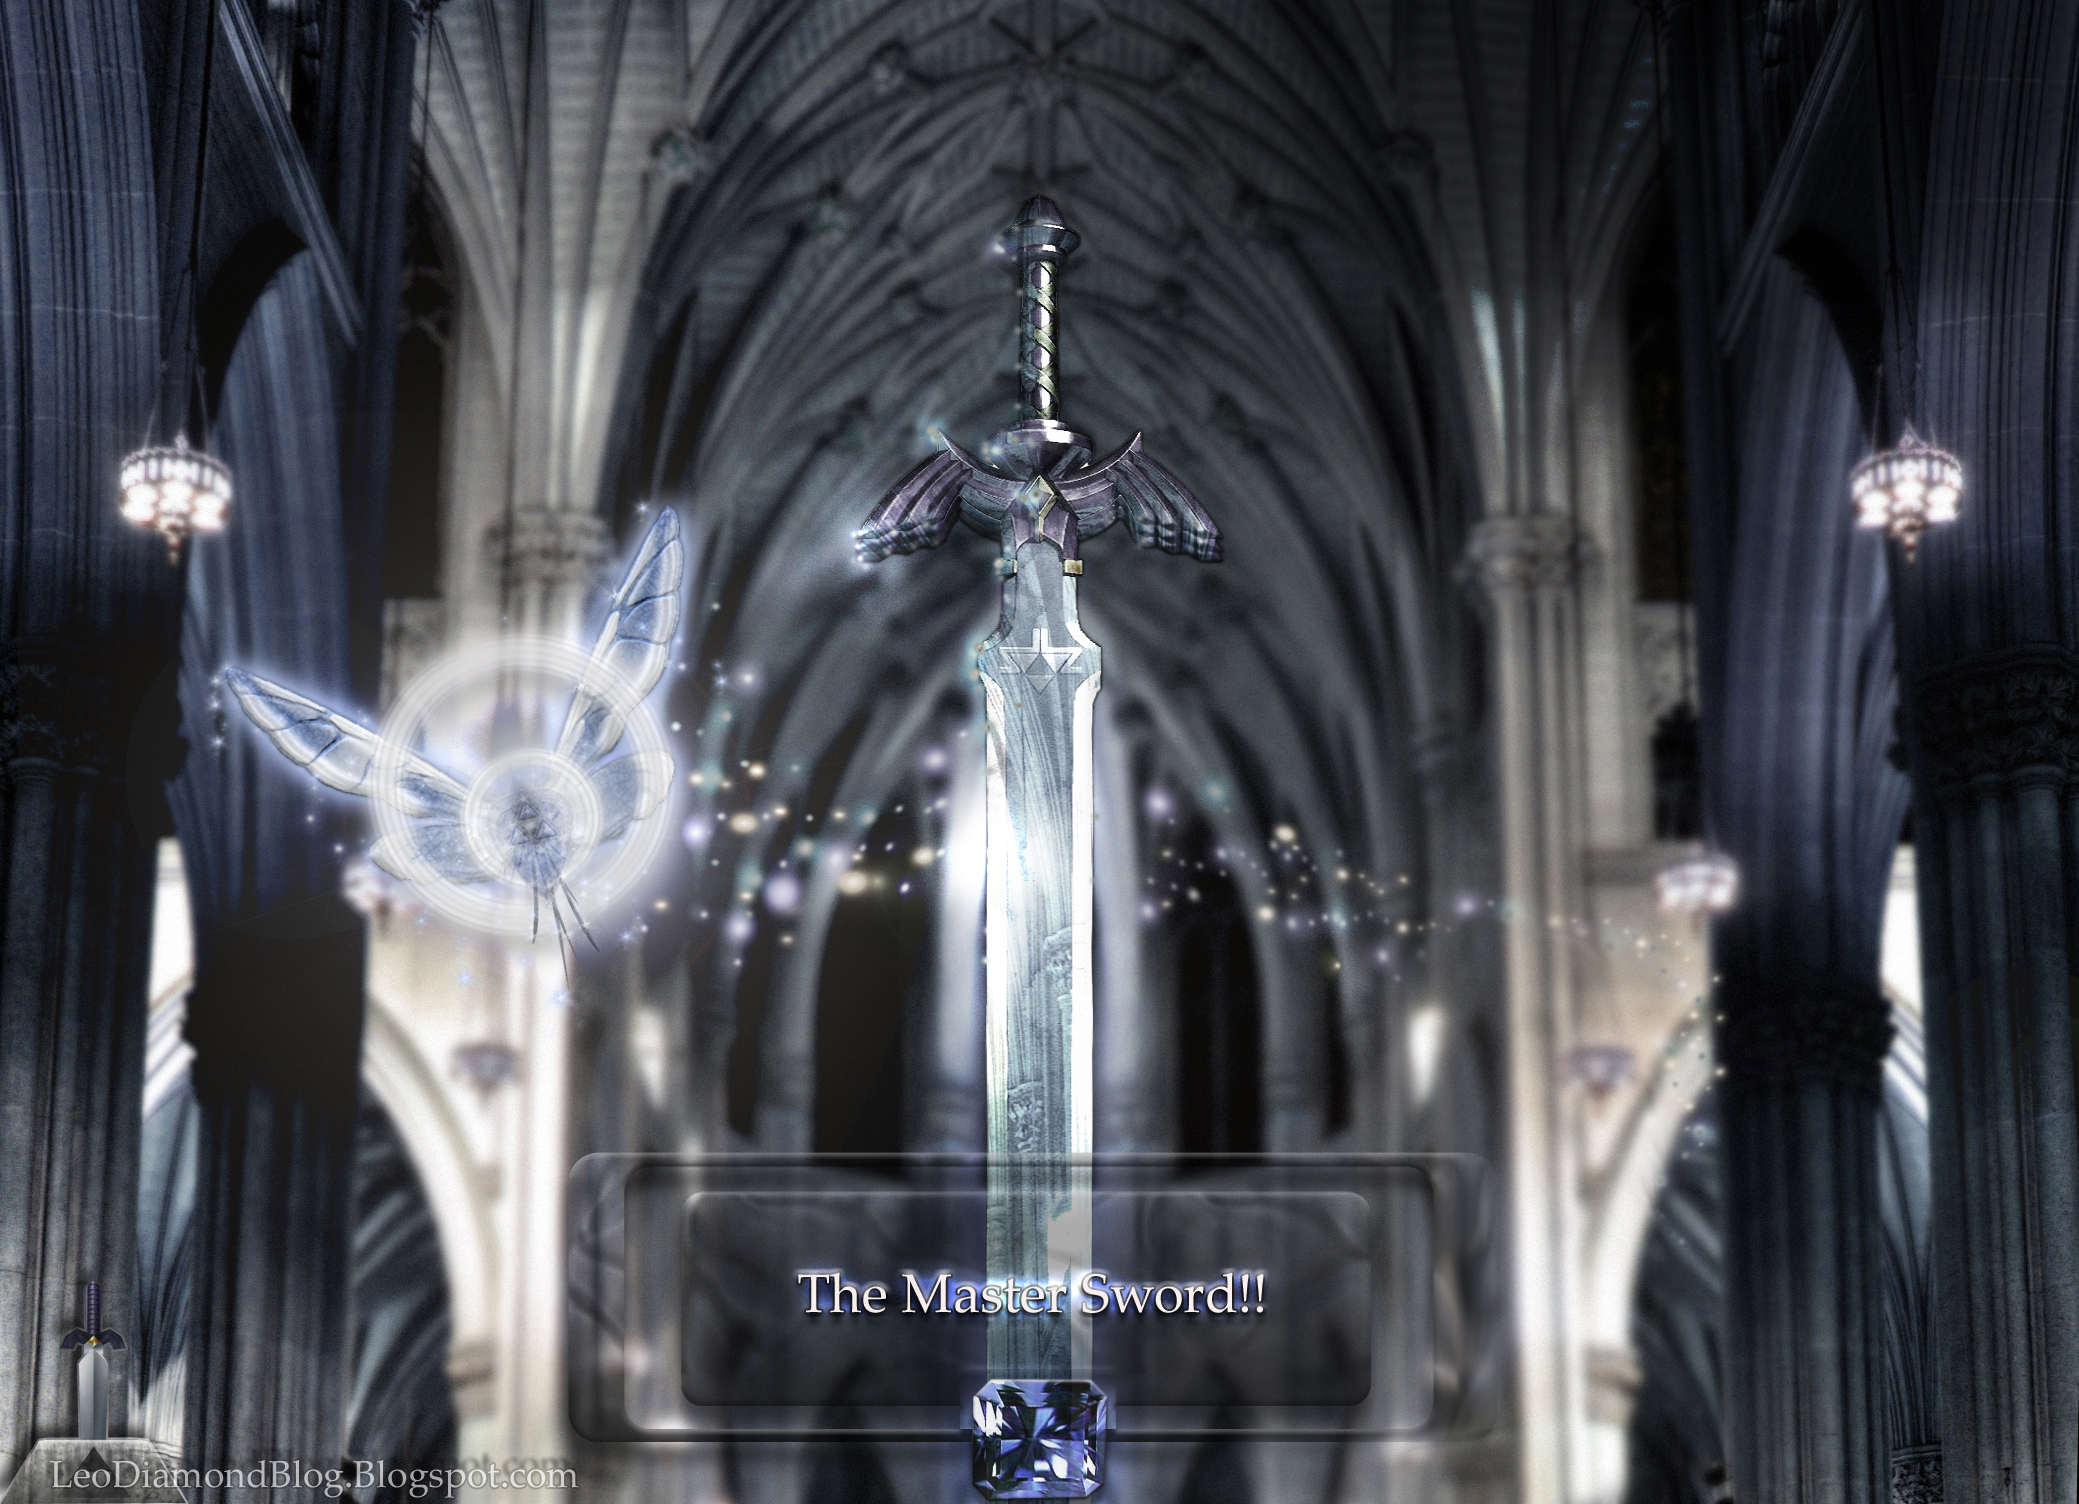 ~The Master Sword!! by LeoDiamond